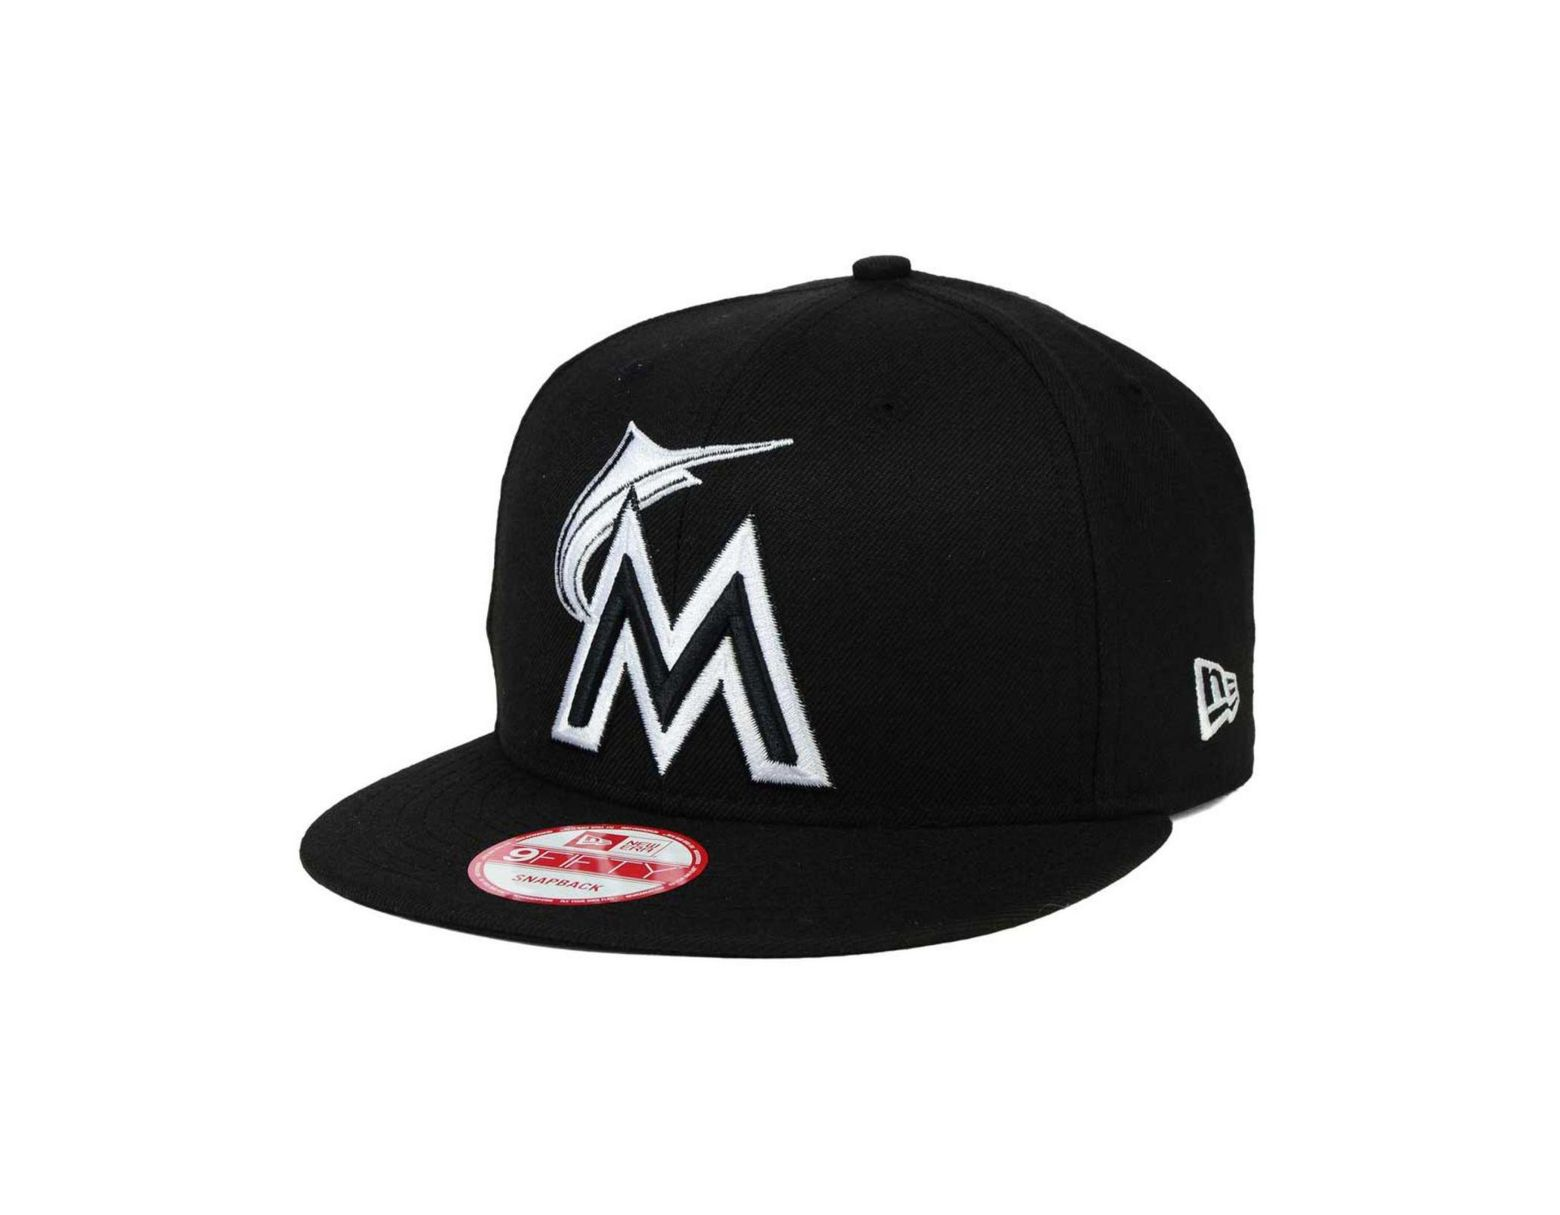 best website bc18d 11183 KTZ Miami Marlins Mlb Black White 9fifty Snapback Cap in Black for Men -  Lyst